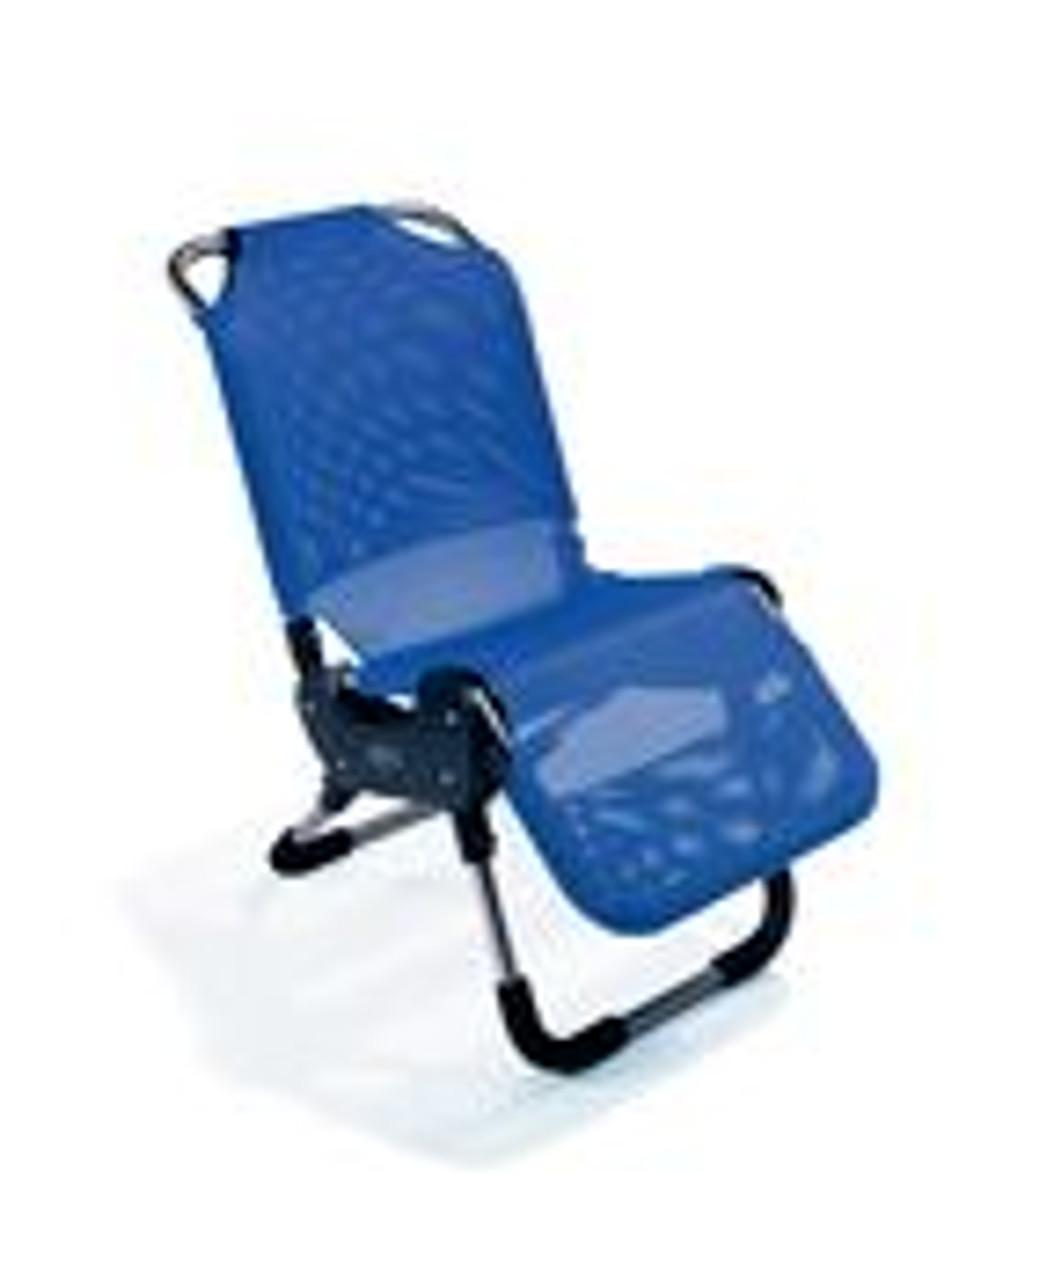 Fabulous 92687602 Patterson Medical Tumble Forms Starfish Bath Chair Size 1 Ocean Blue Creativecarmelina Interior Chair Design Creativecarmelinacom